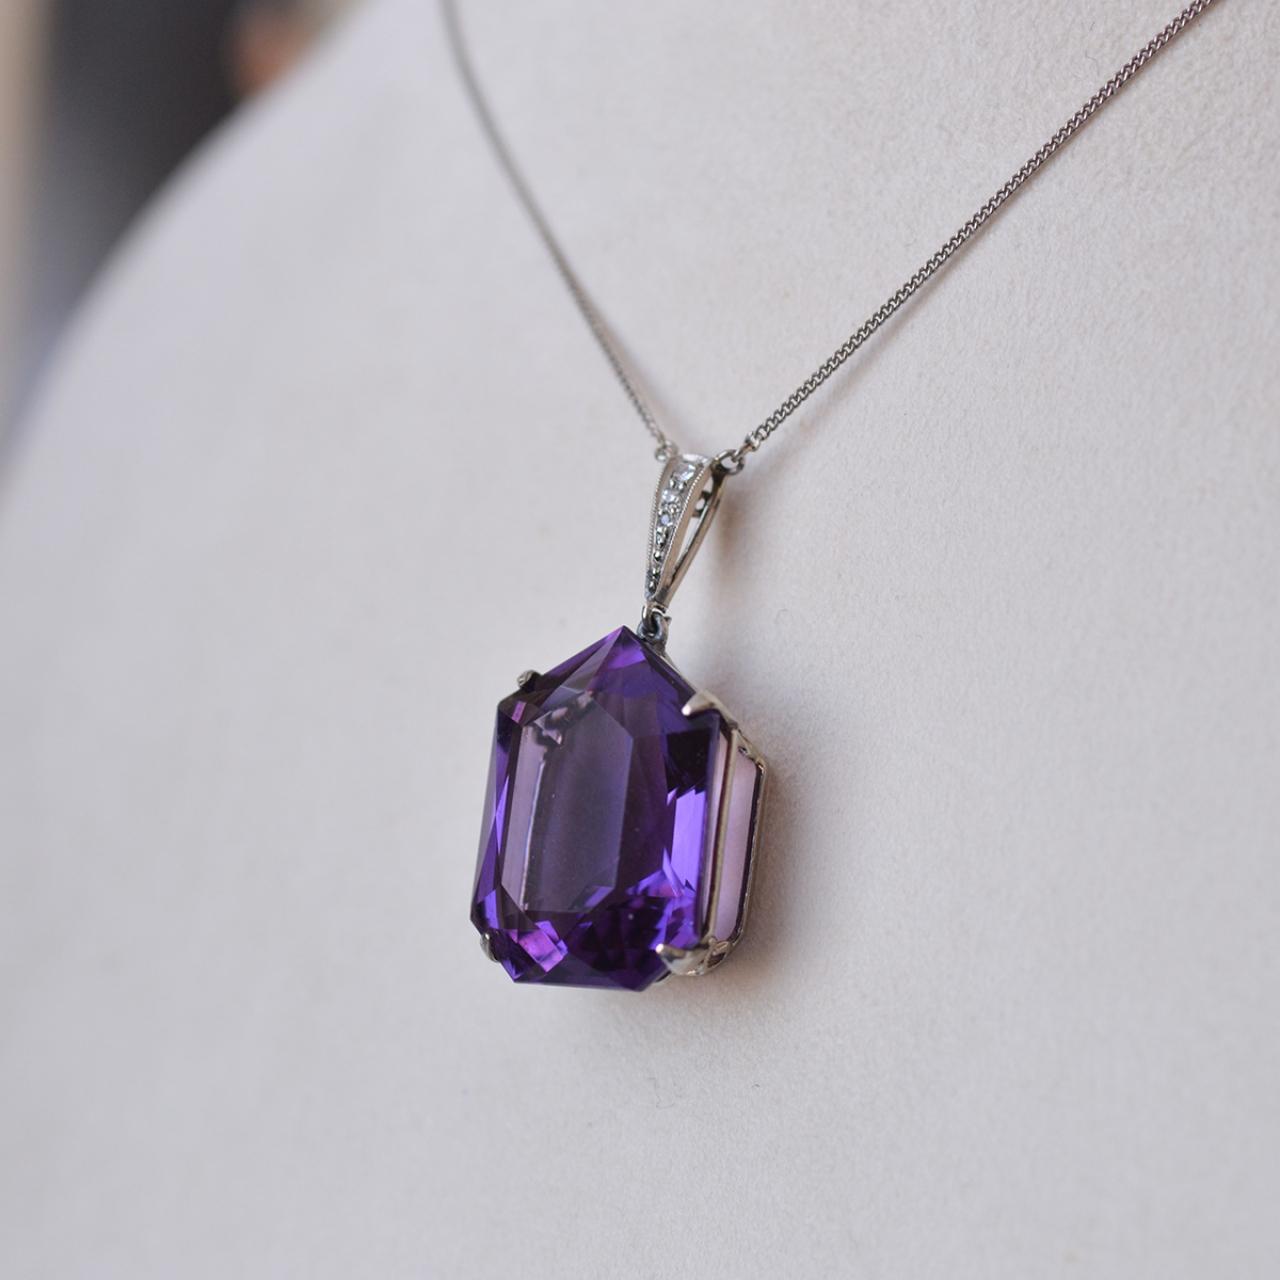 deco amethyst pendant deco necklace with pendant